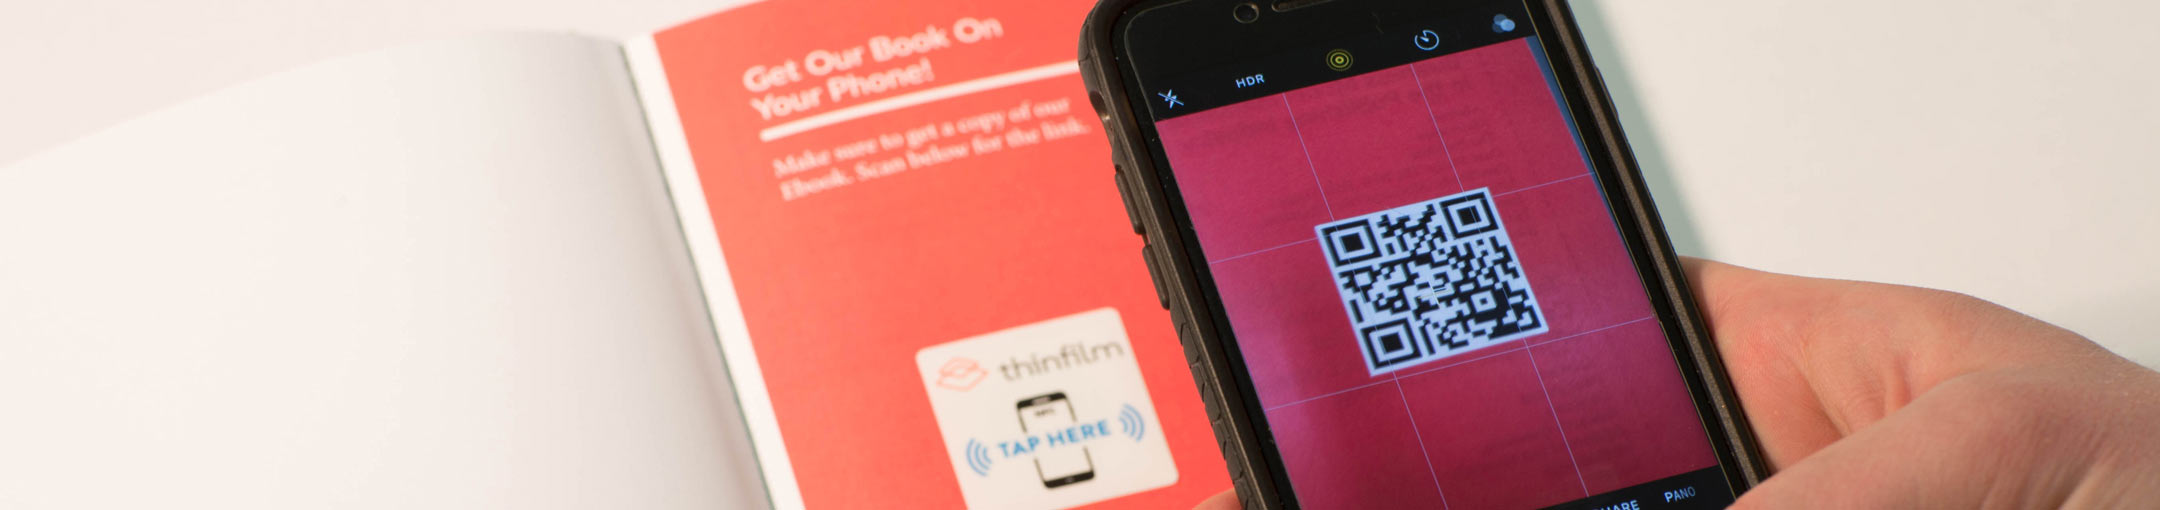 Close up of a phone scanning a QR code.